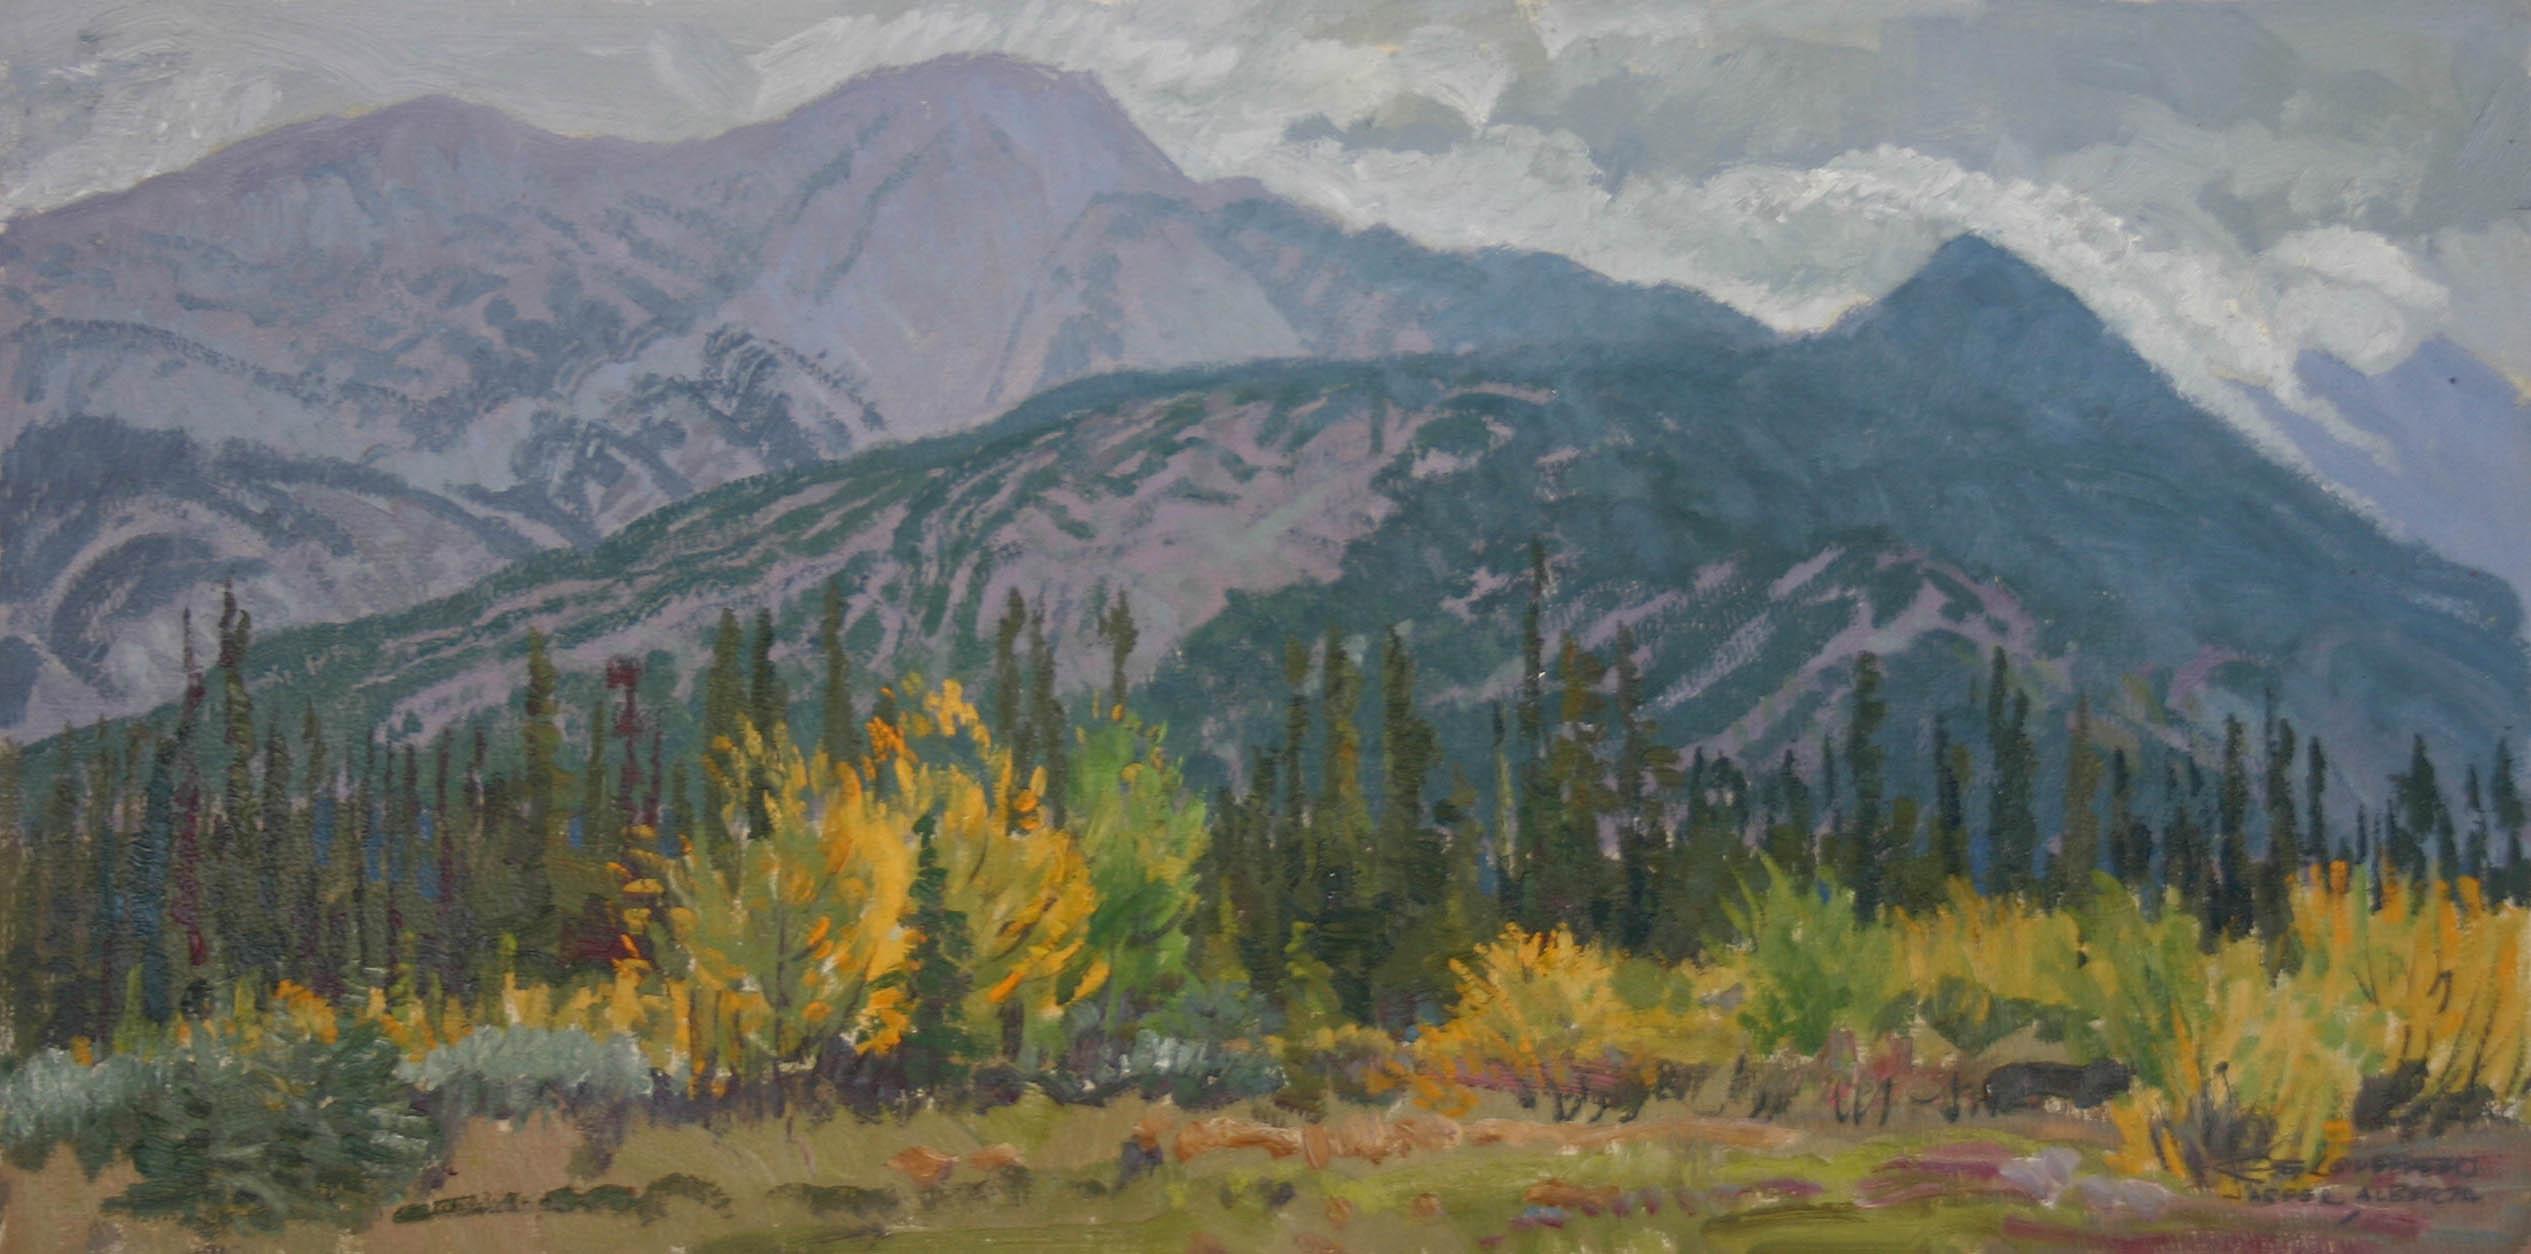 Jasper, Alberta by  Robert Lougheed - Masterpiece Online